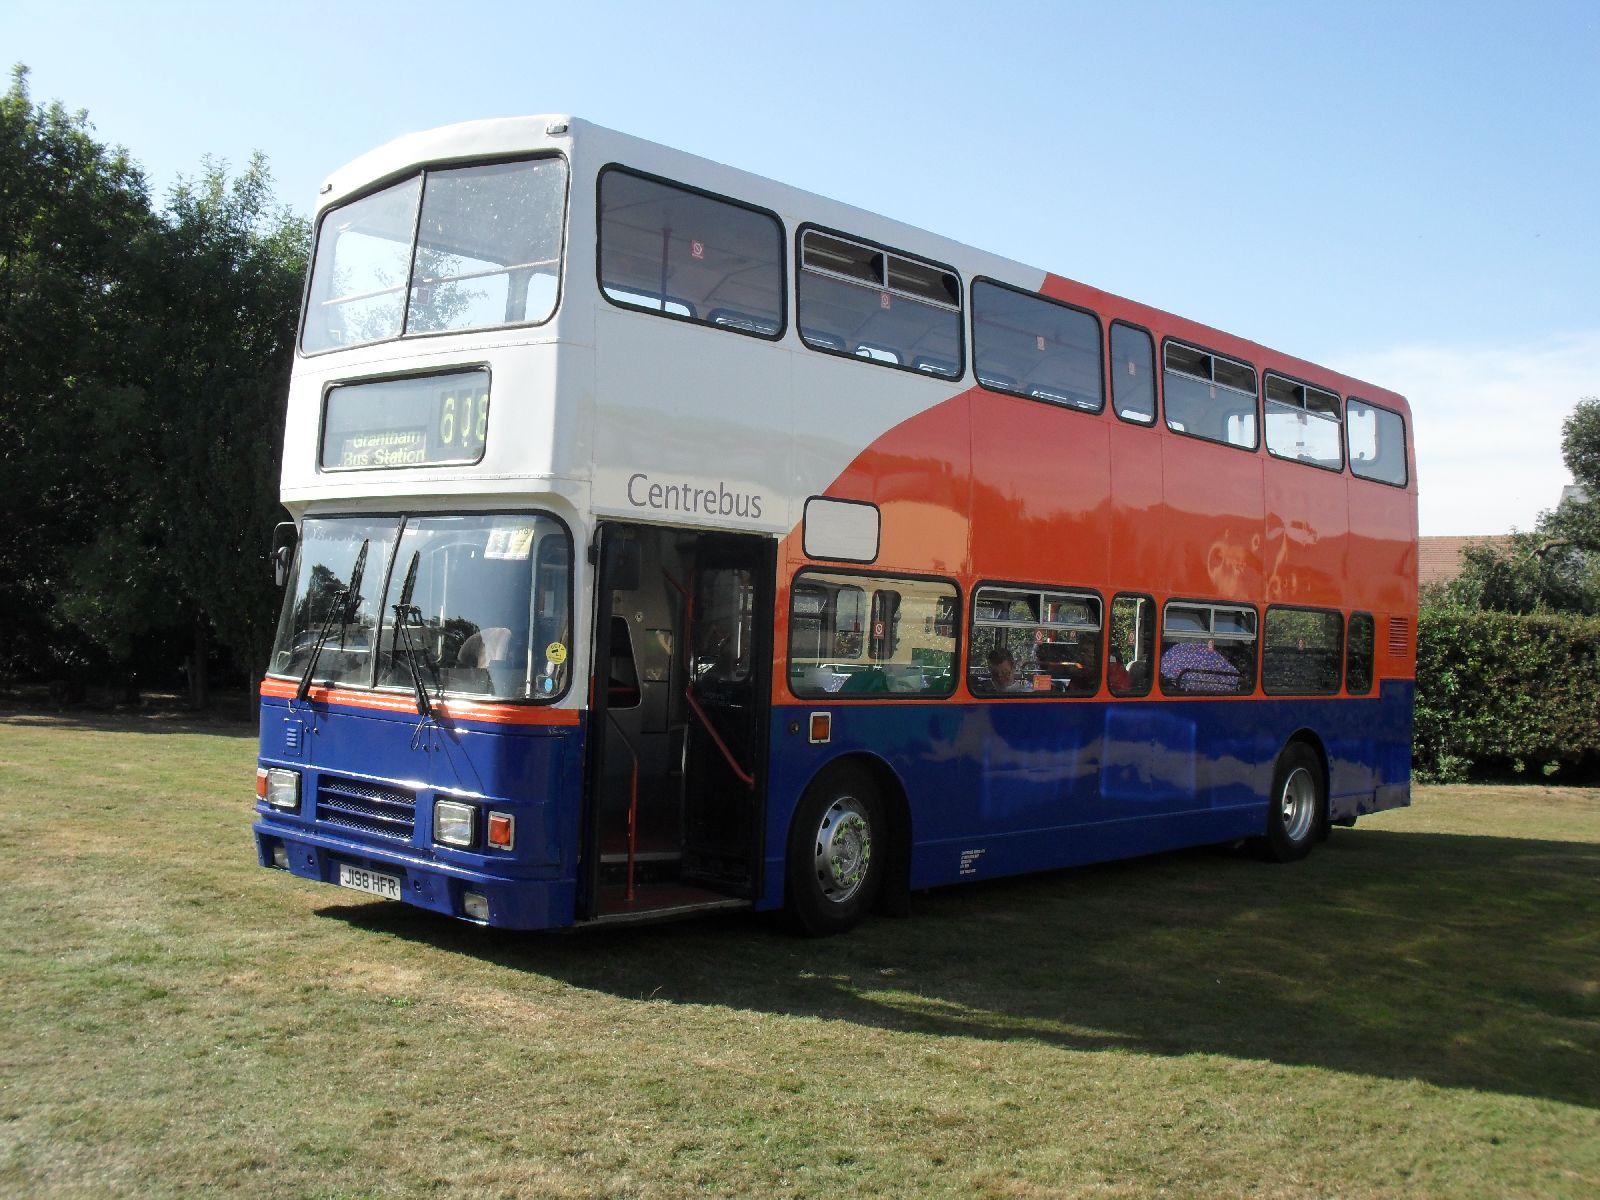 File:Centrebus bus 809 (J198 HFR), Showbus rally 2009 jpg